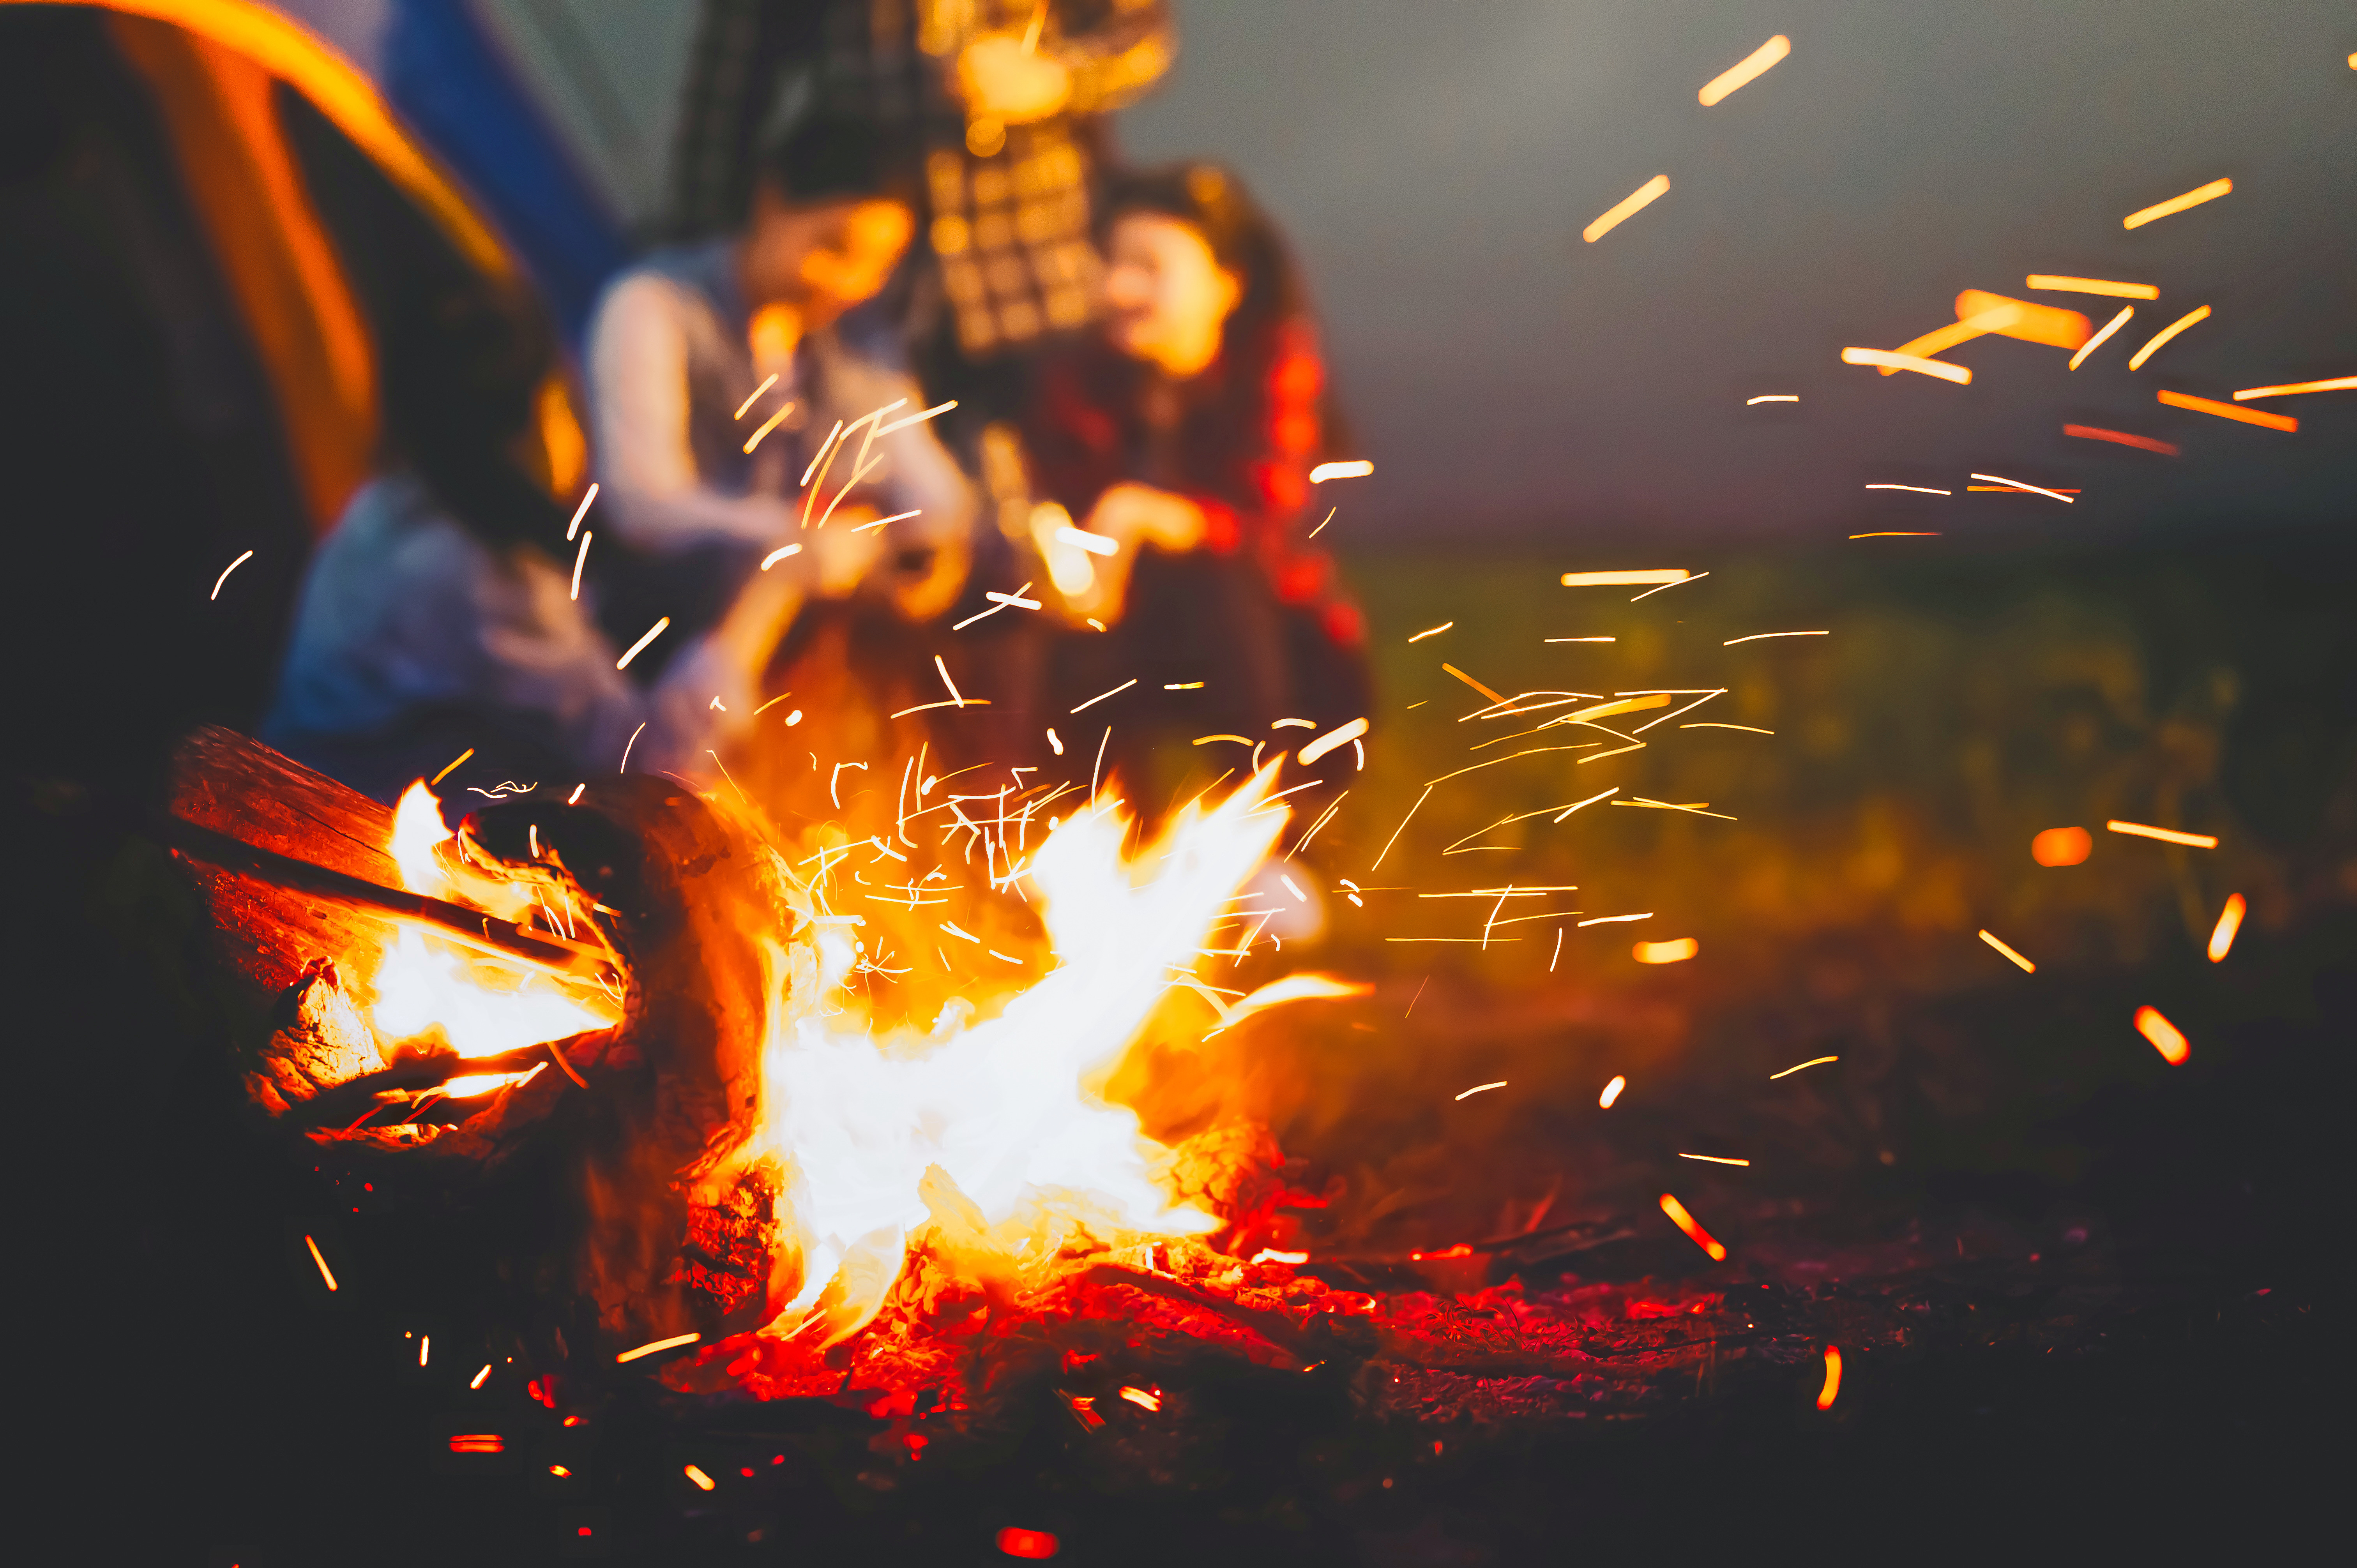 1575362306_bonfire3.jpg